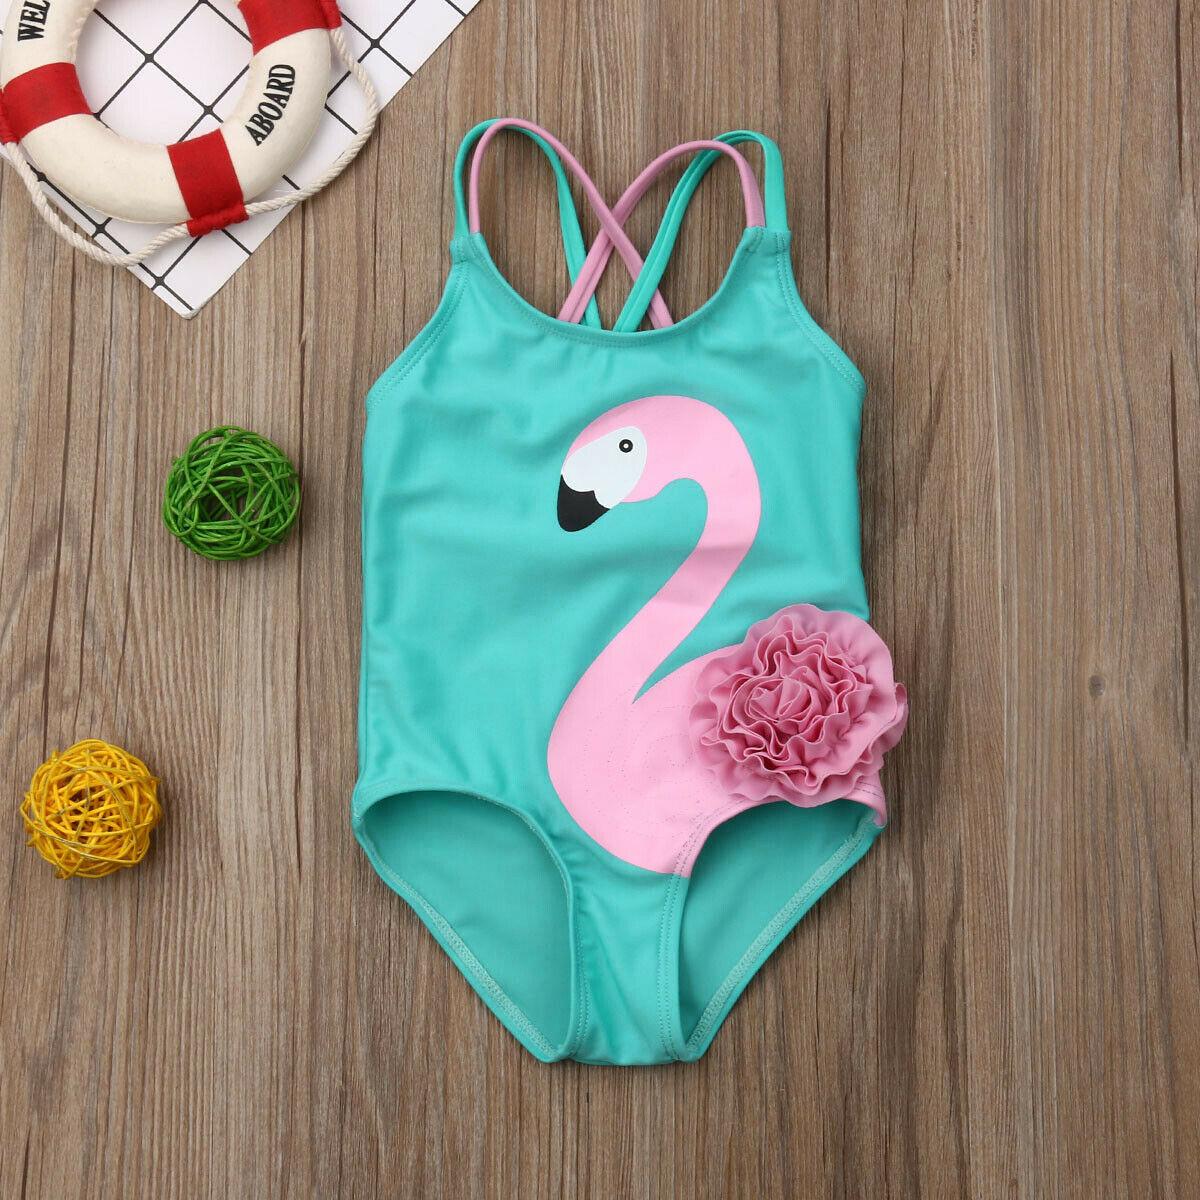 Toddler Kids Baby Girls Flamingo Sleeveless Bikini Swimwear Swimsuit Beachwear Bathing Suit